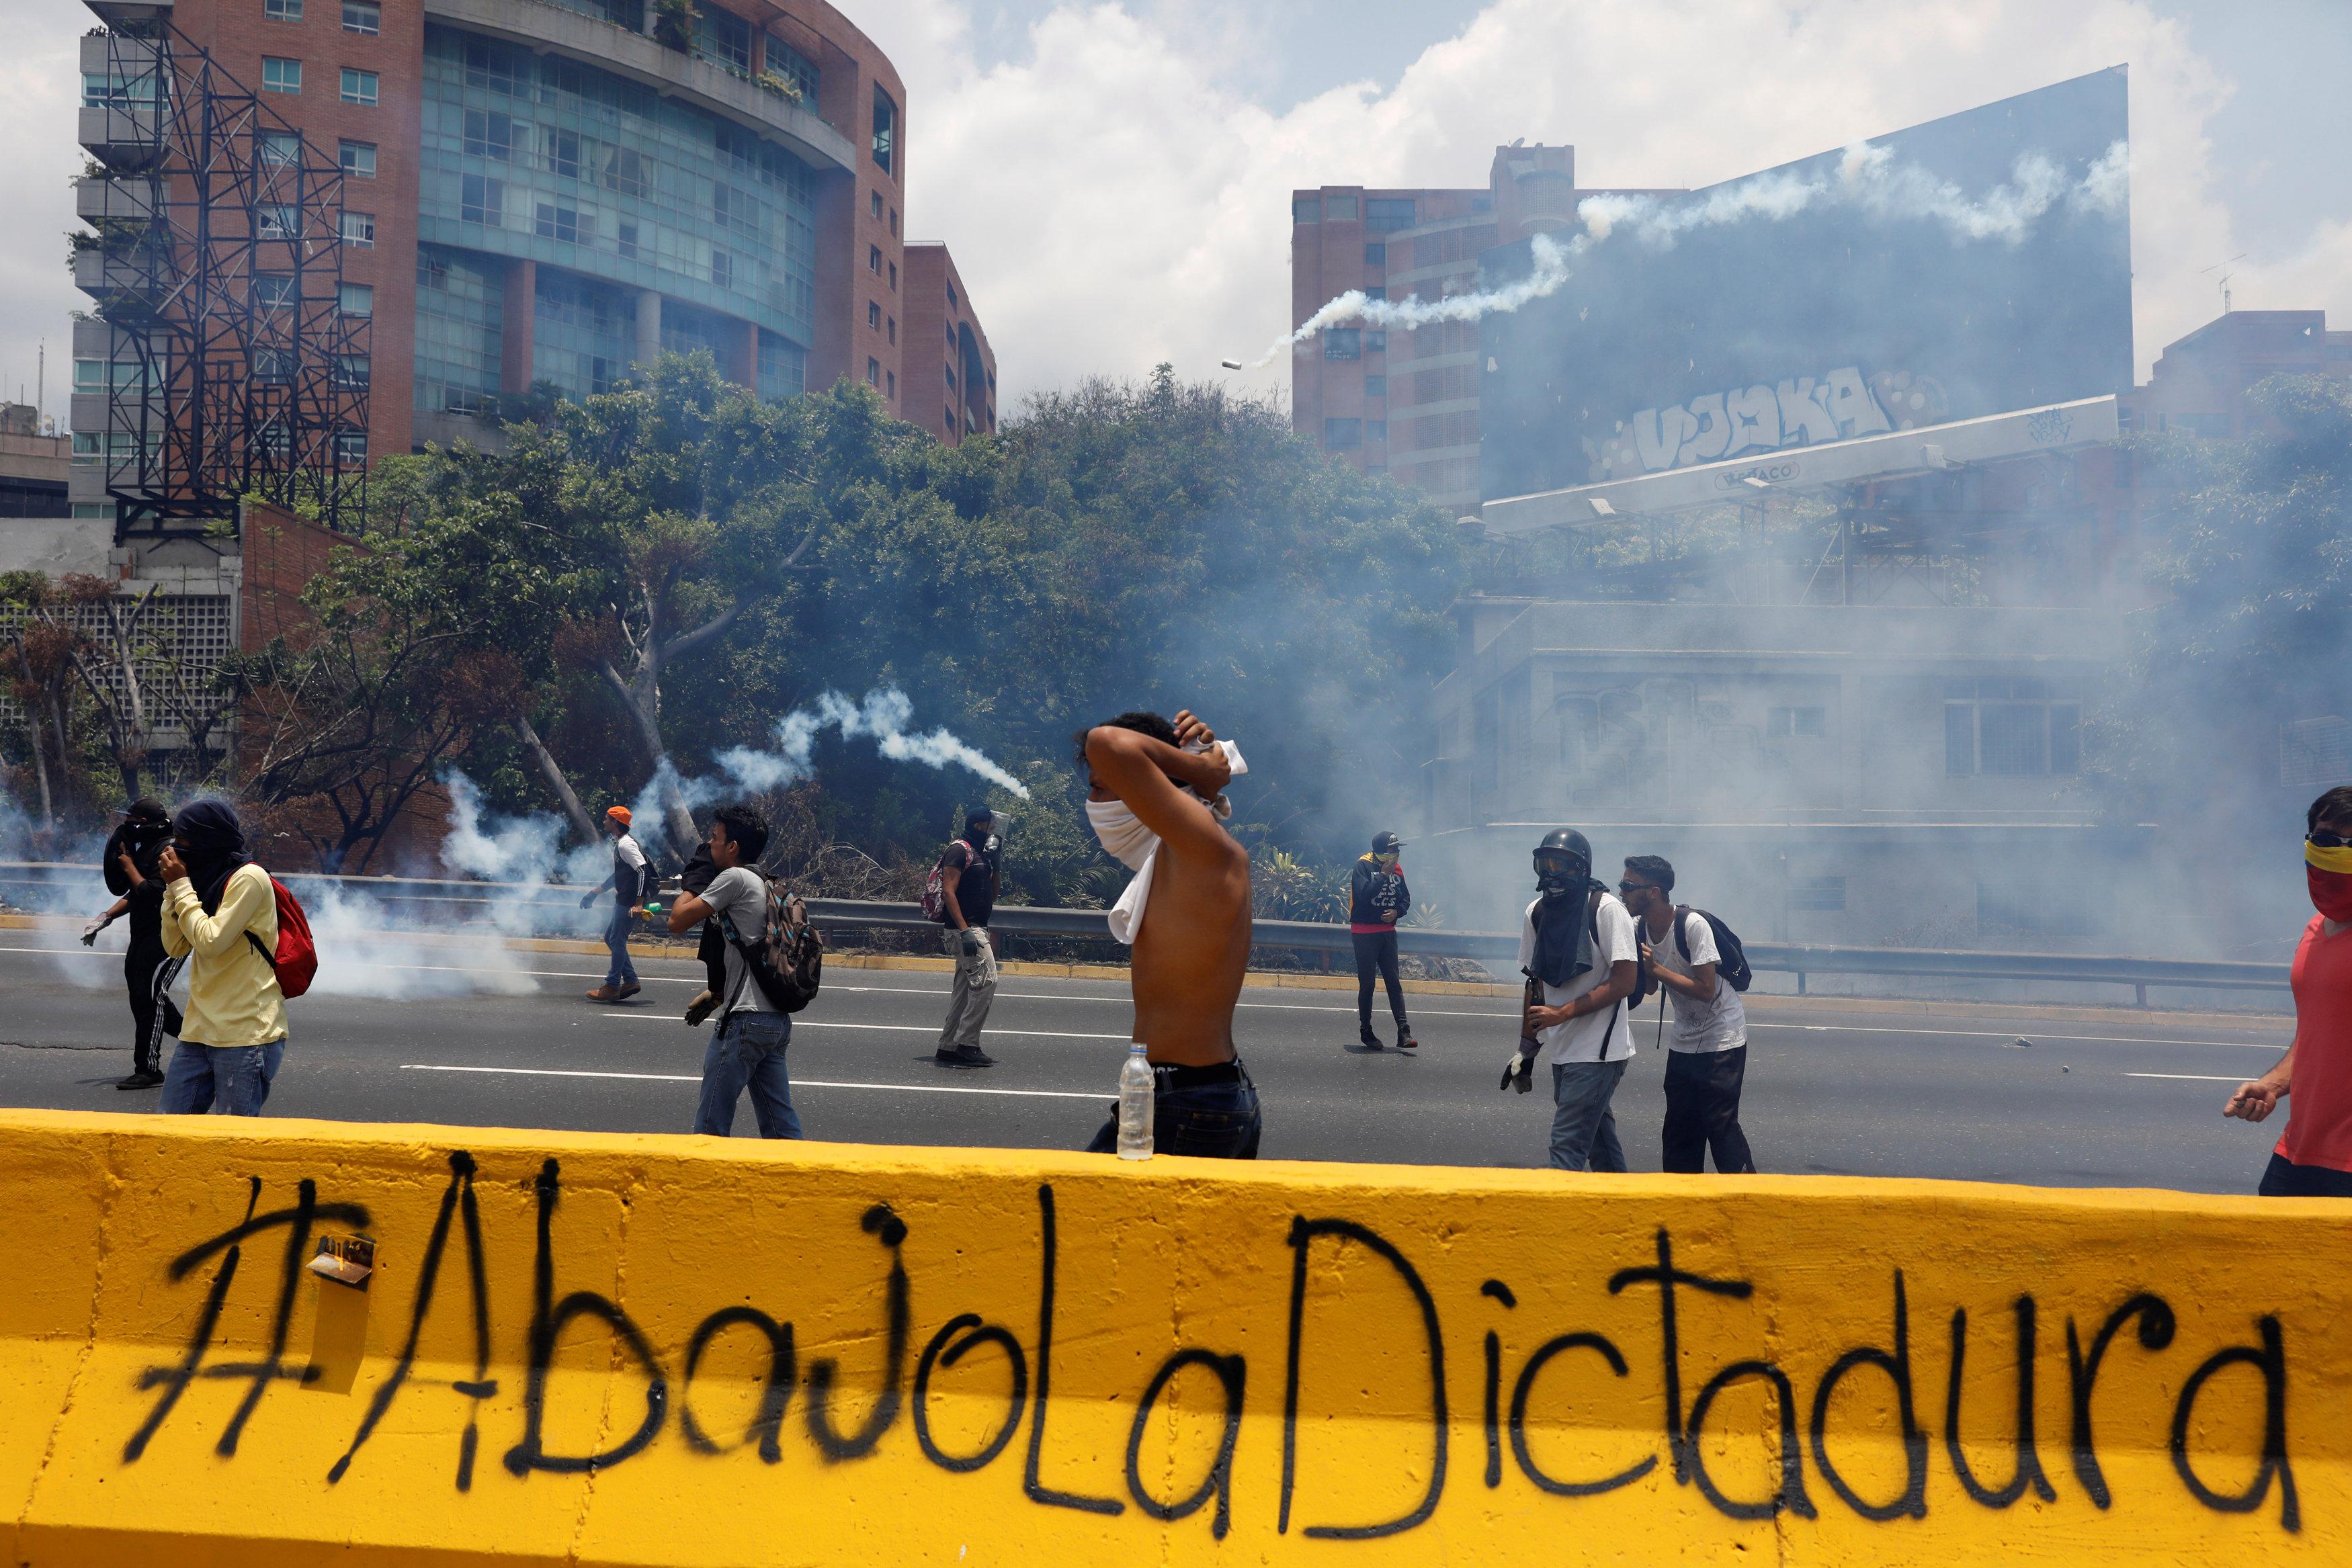 Demonstrators rally against Venezuela's President Nicolas Maduro's government in Caracas, Venezuela on April 10, 2017. (REUTERS/Carlos Garcia Rawlins)